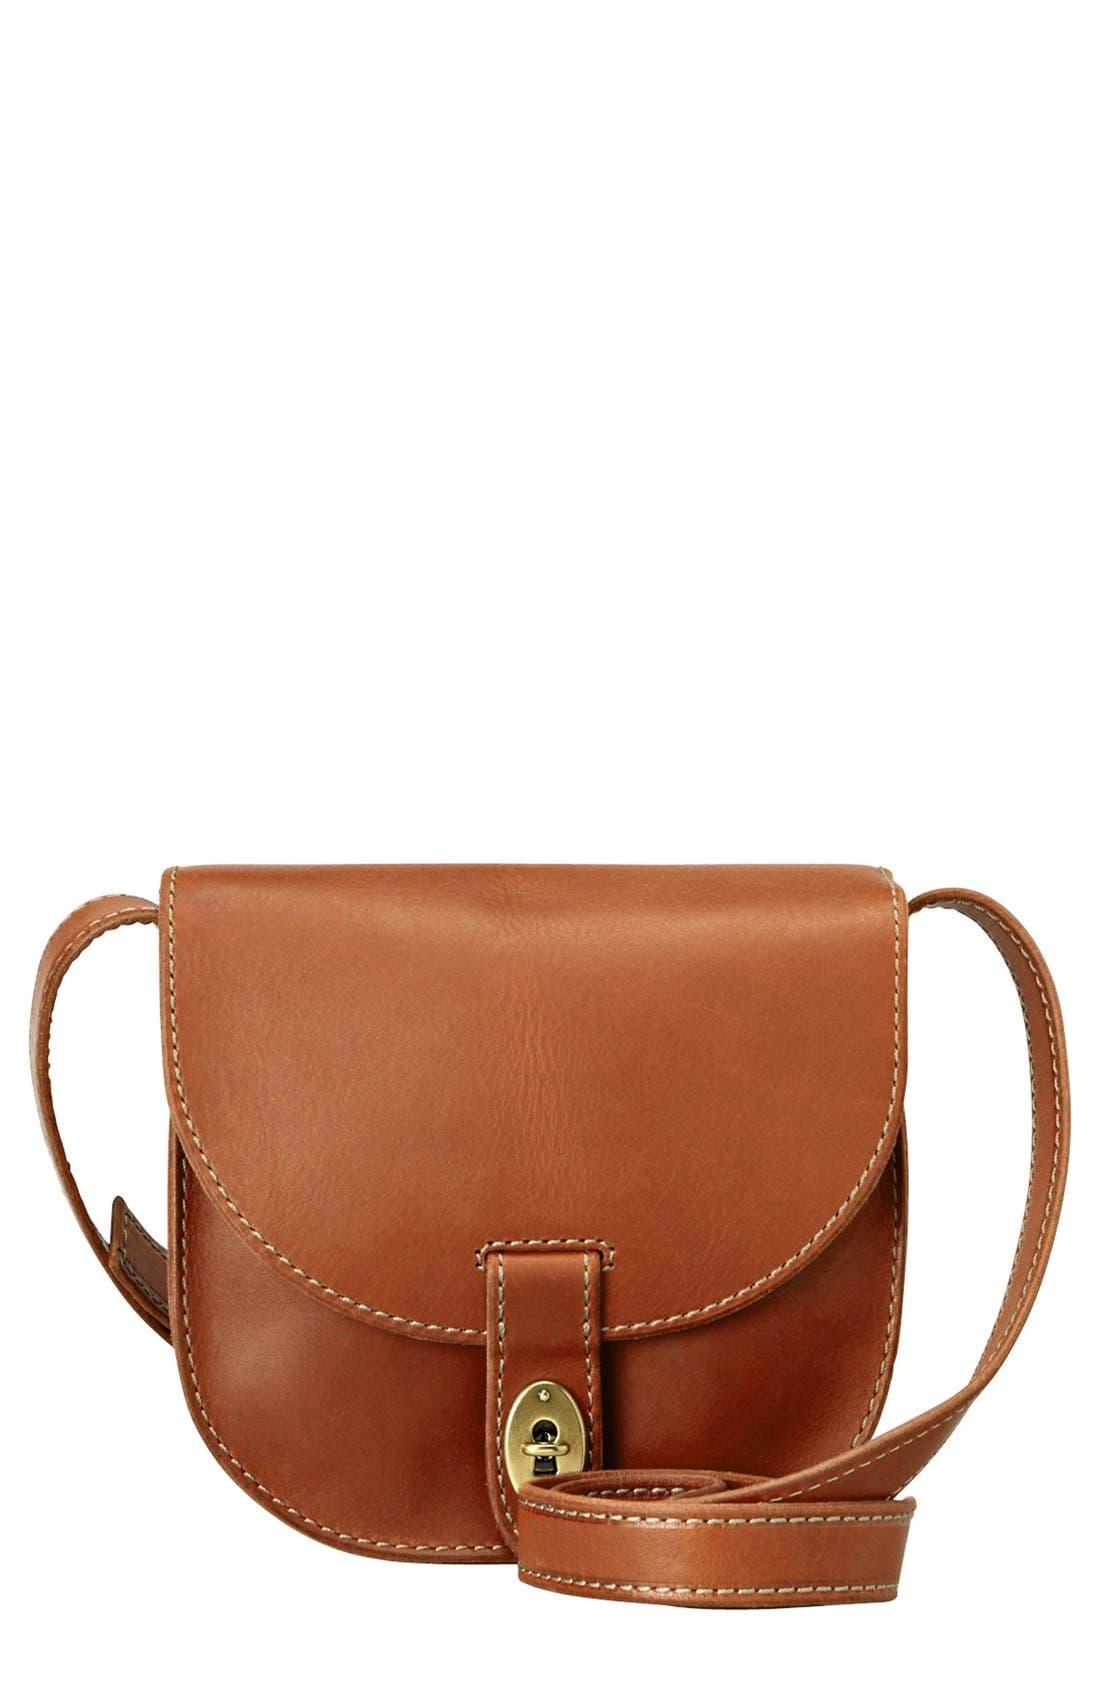 Main Image - Fossil 'Austin - Small' Crossbody Bag